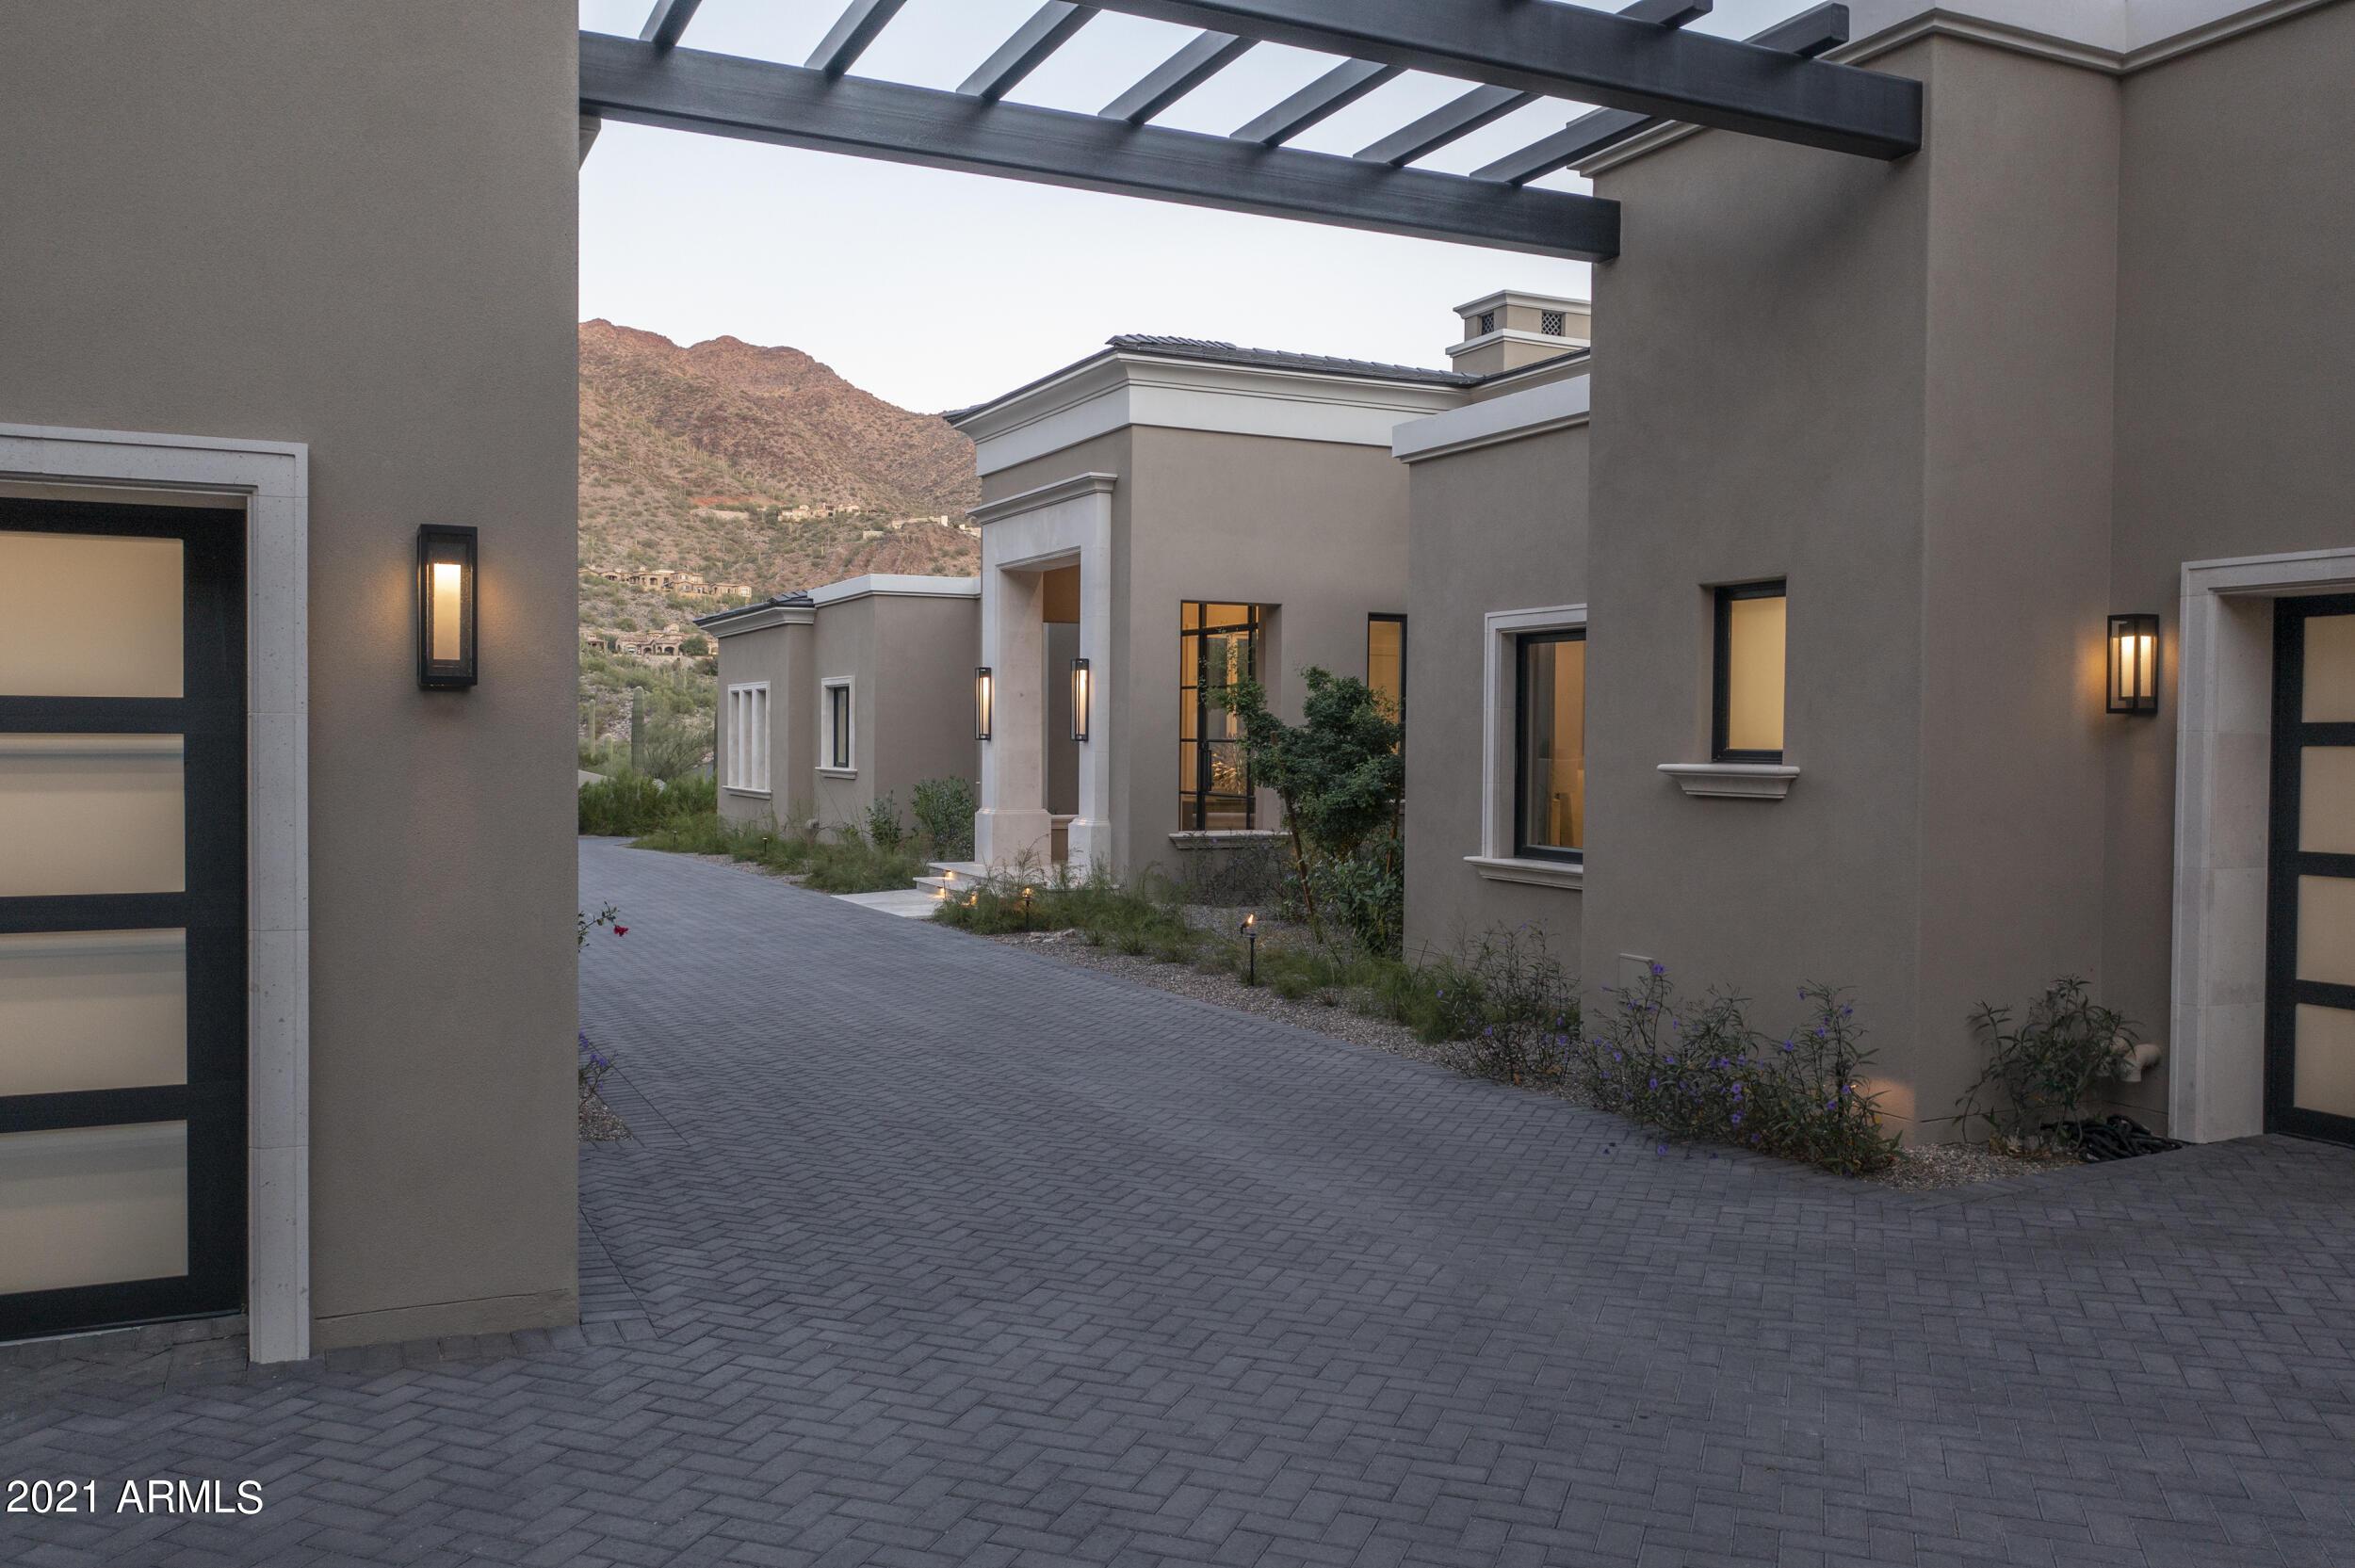 MLS 6311940 10804 E CANYON CROSS Way, Scottsdale, AZ 85255 Scottsdale AZ Luxury